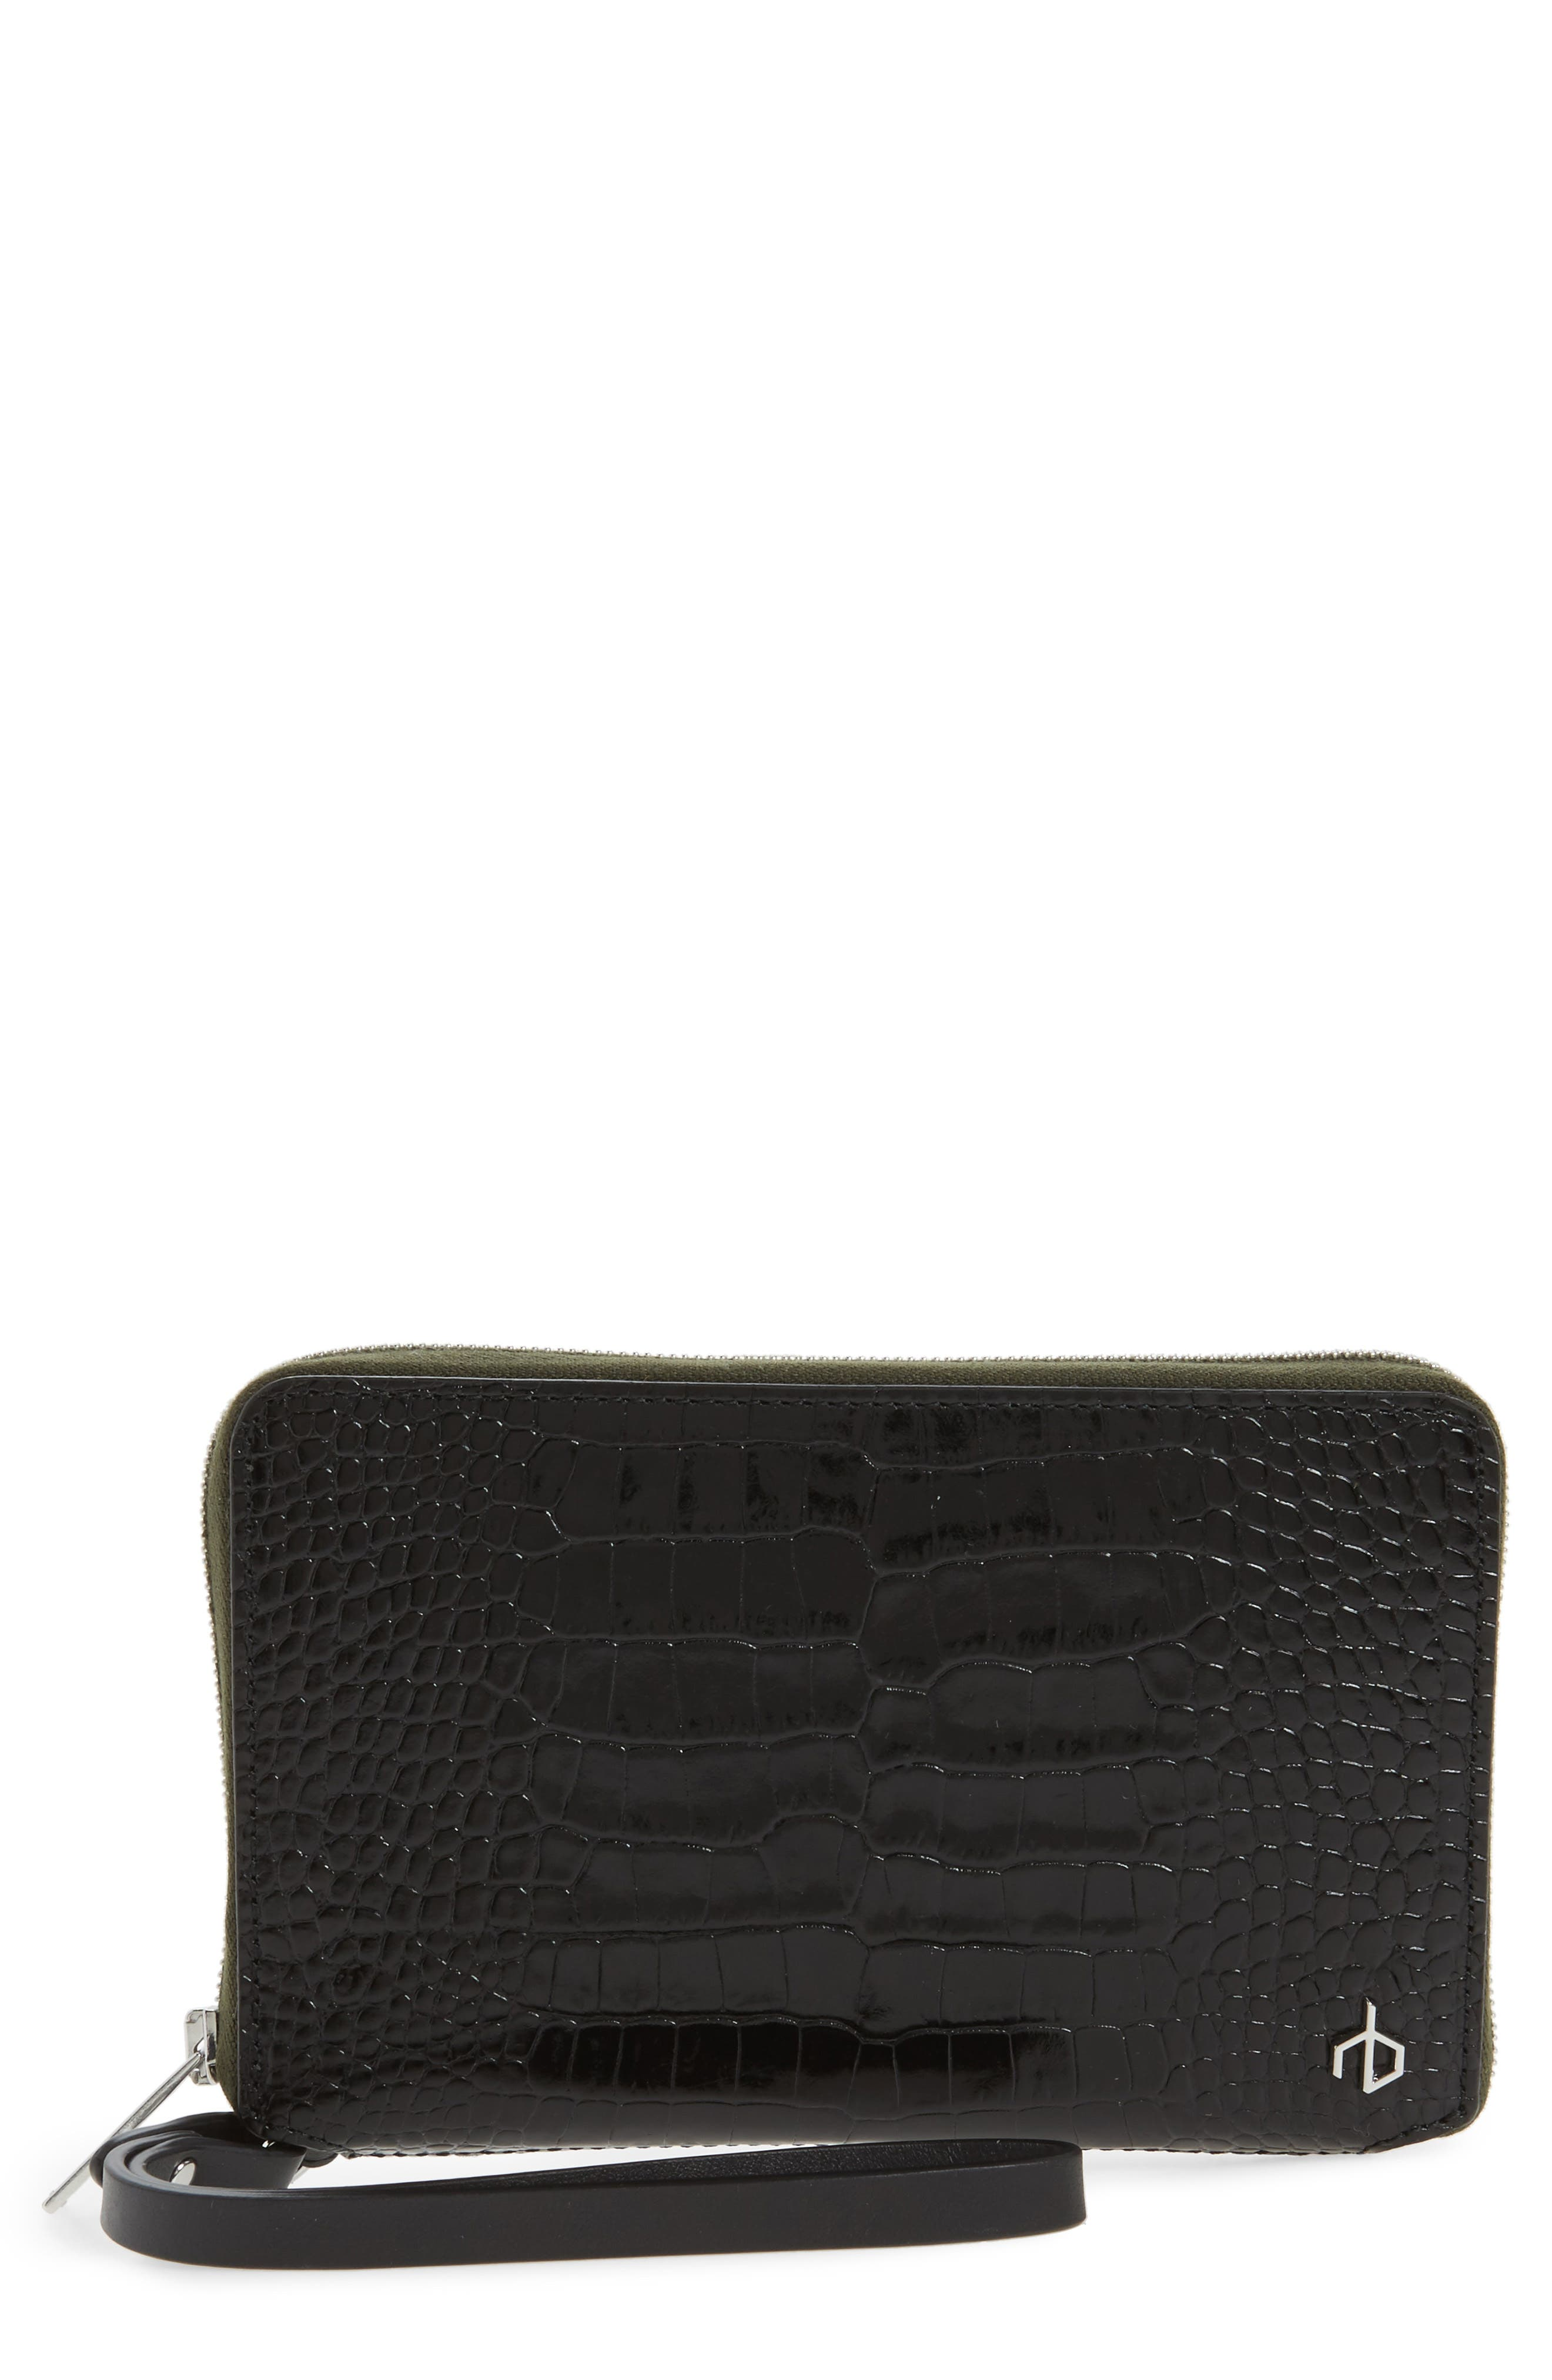 Croc Embossed Leather Smartphone Wallet,                         Main,                         color, Black Croco